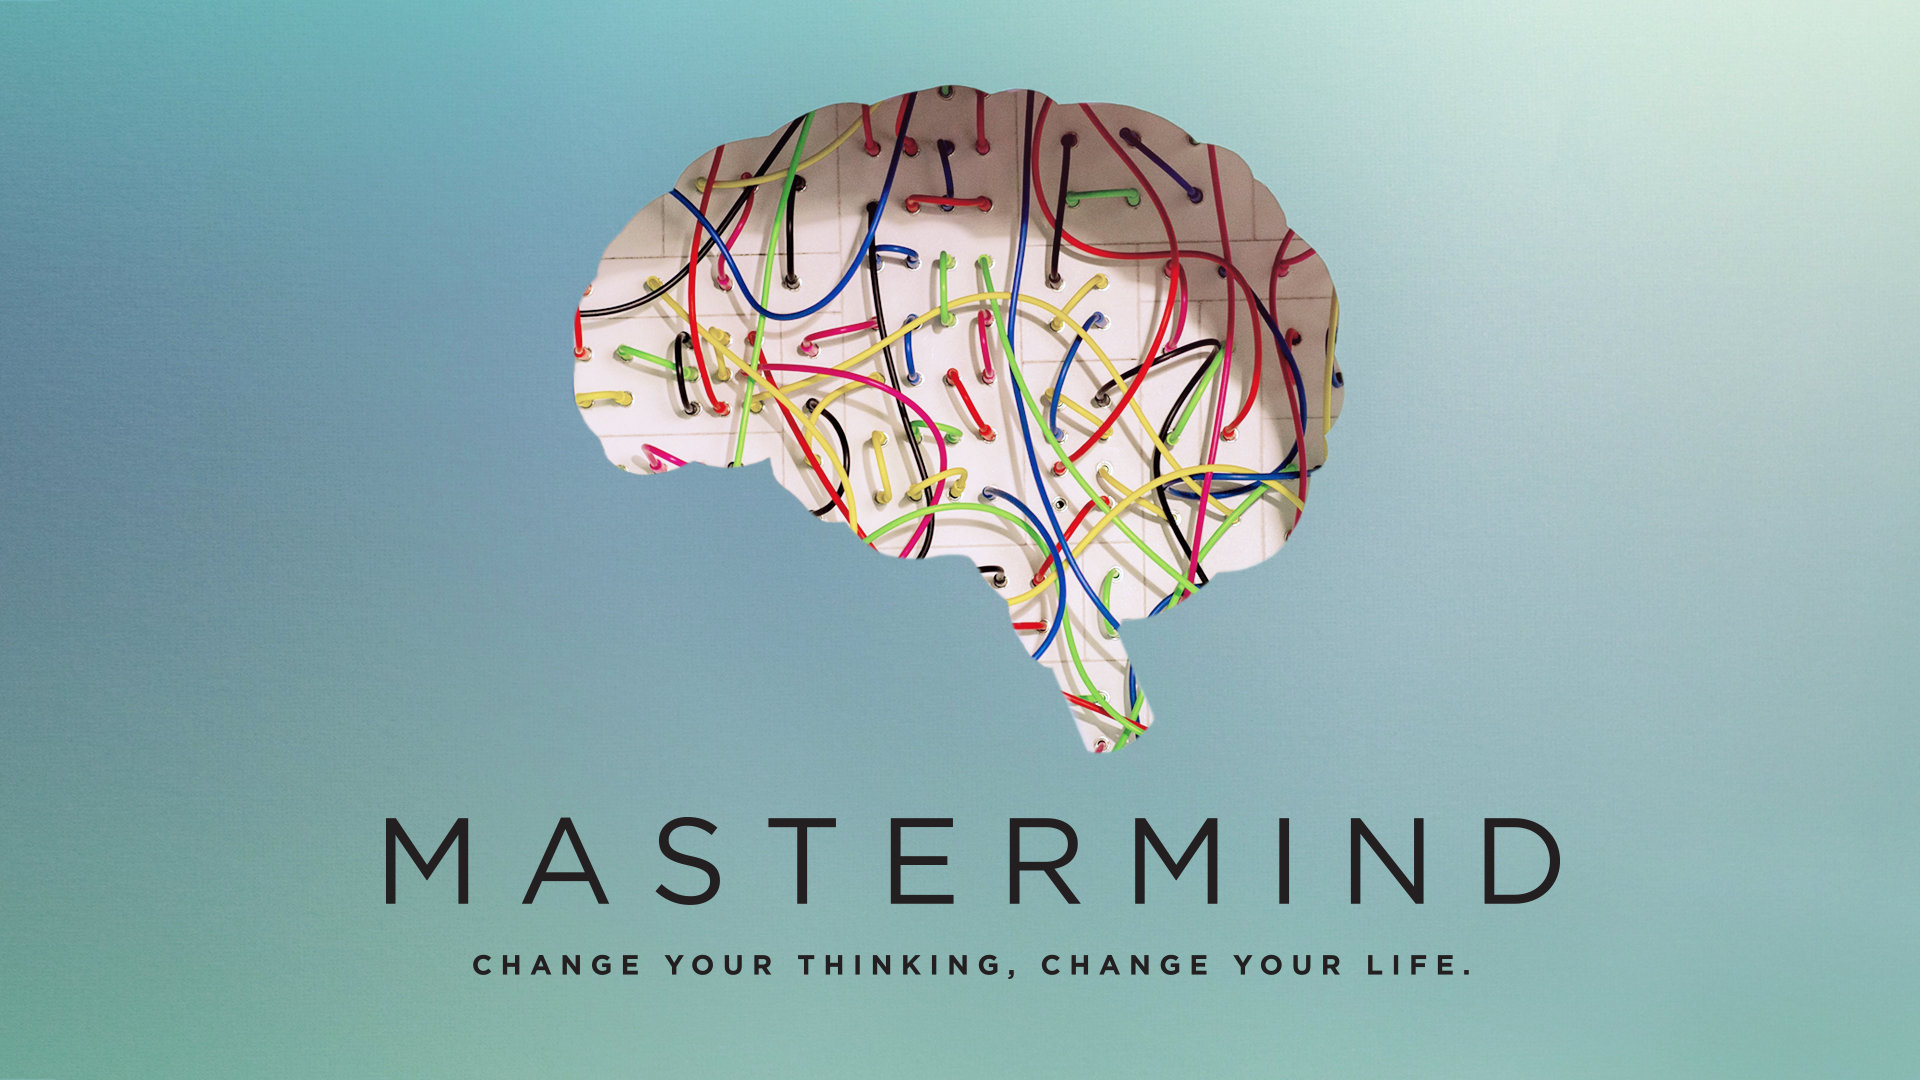 Mastermind_Artwork_Horizontal.jpg